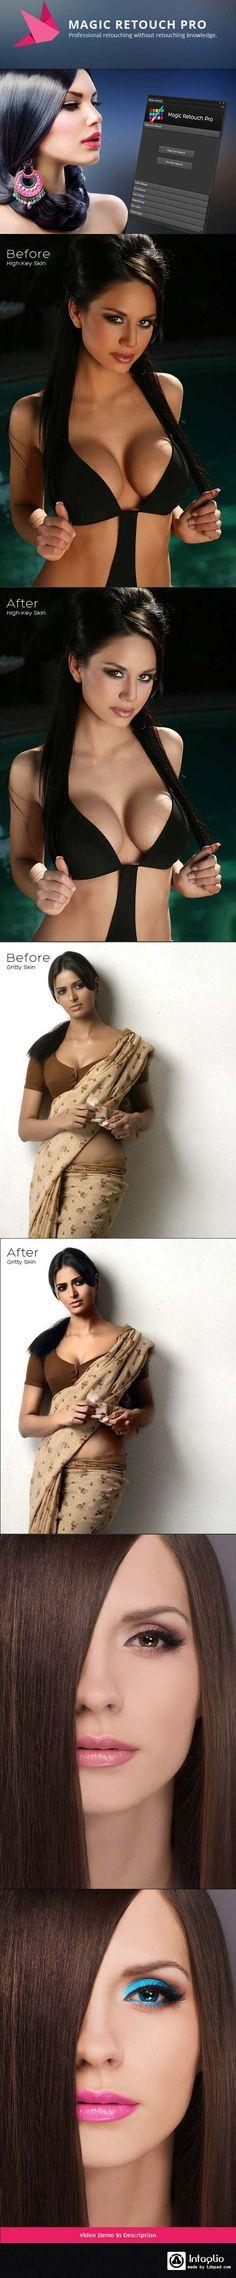 Magic Retouch skin Photoshop Action